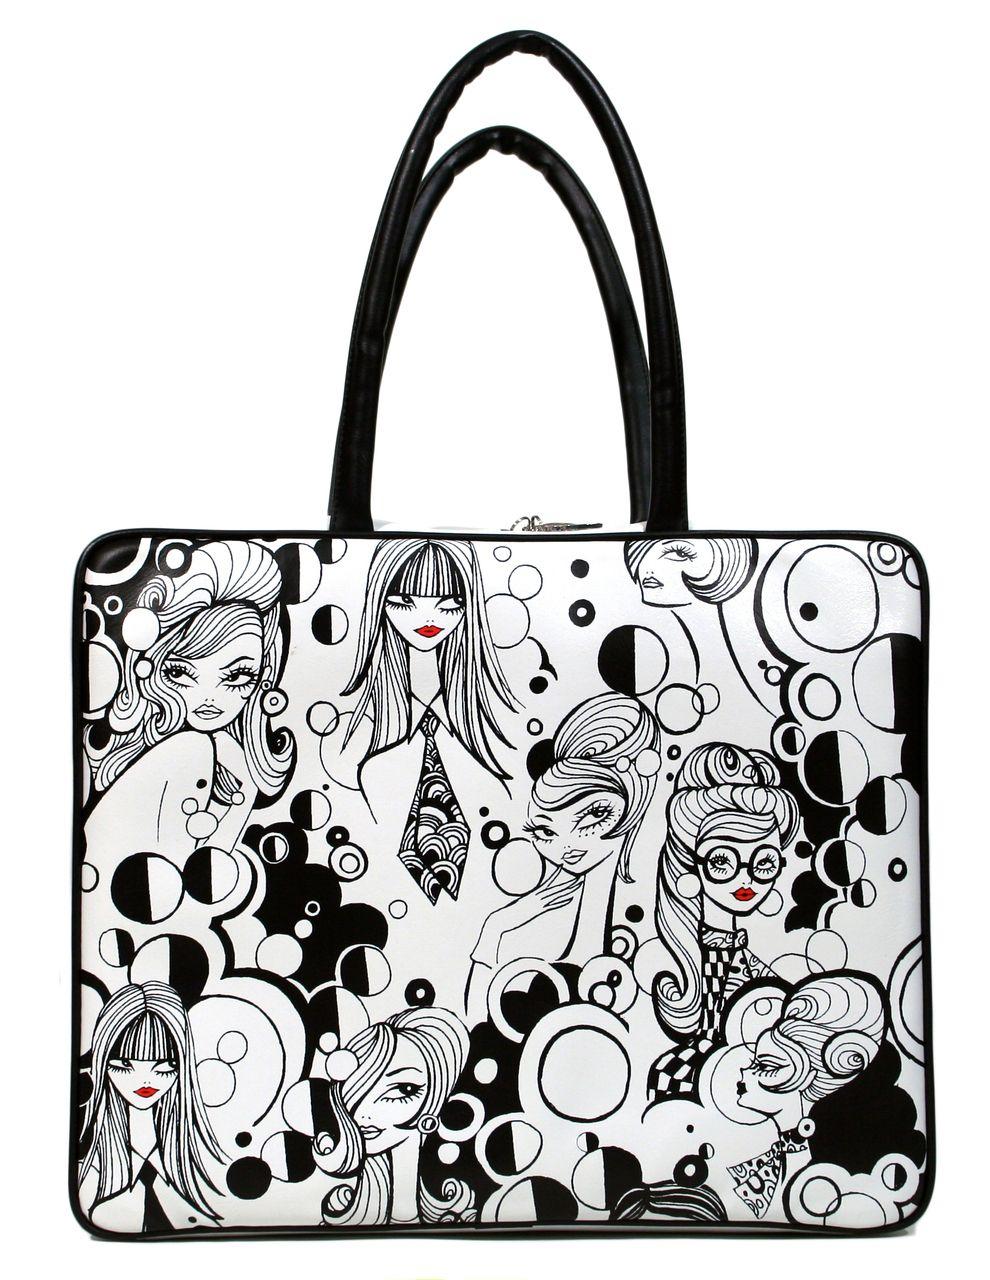 8596e4293b Fluff mod laptop bag jpg 990x1280 Fluff purses and products